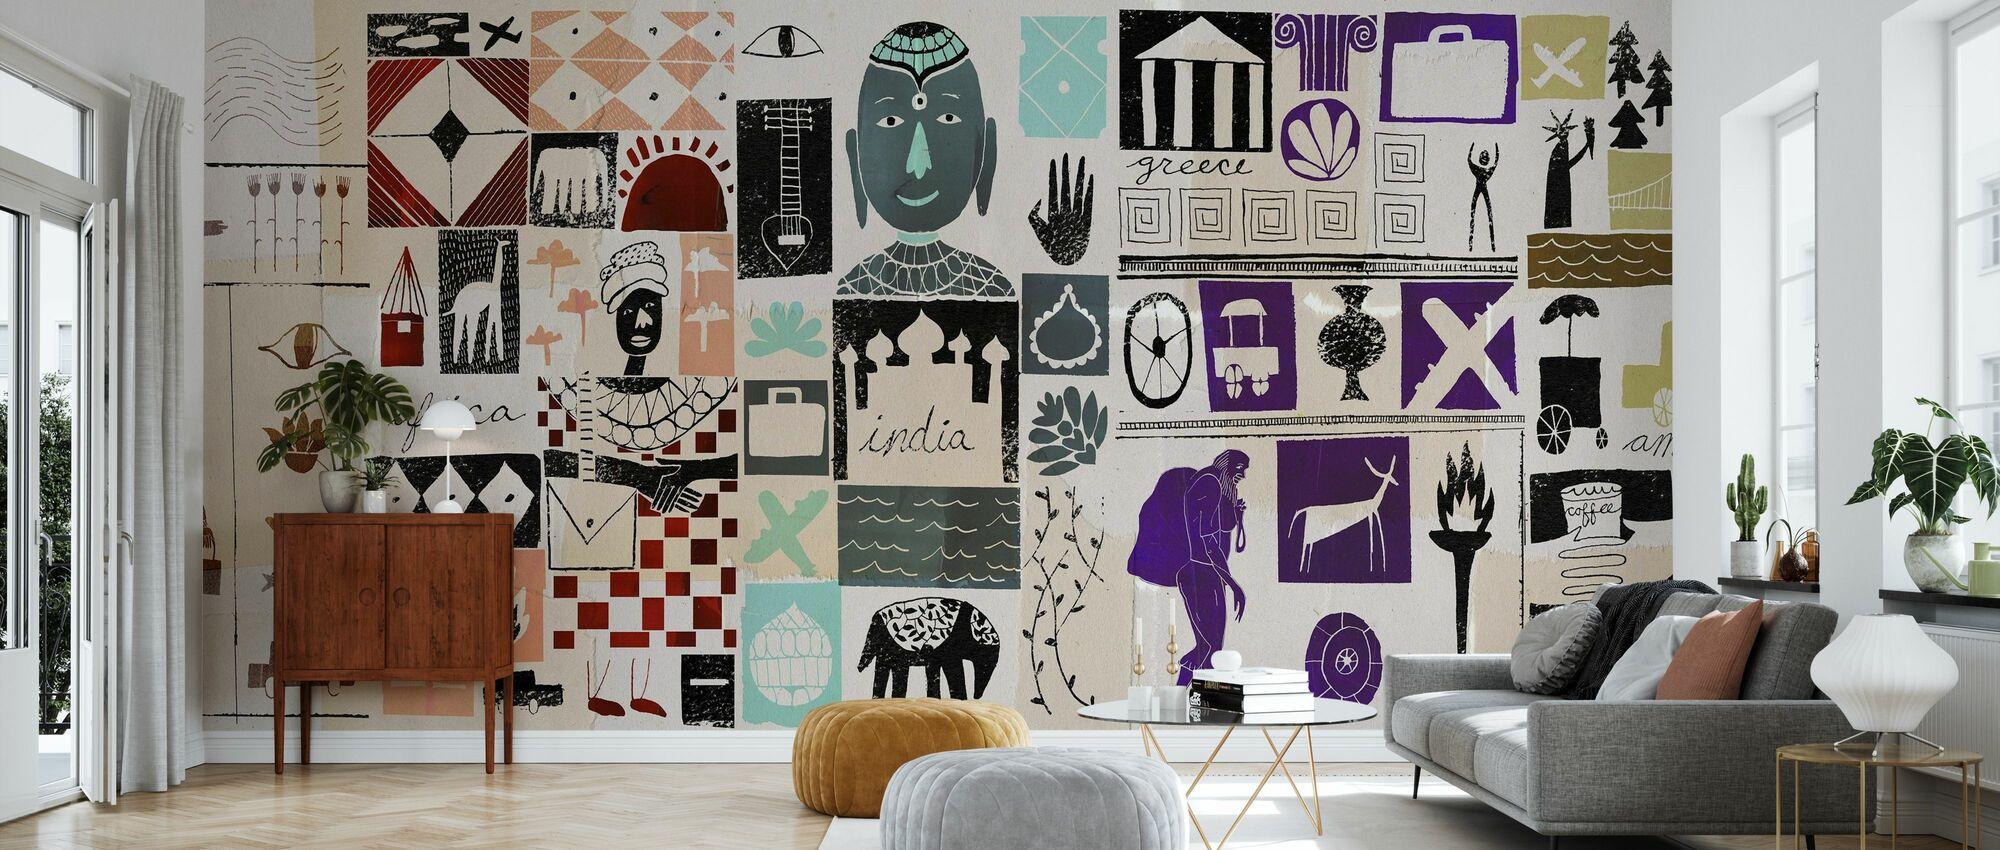 World Travels - Wallpaper - Living Room